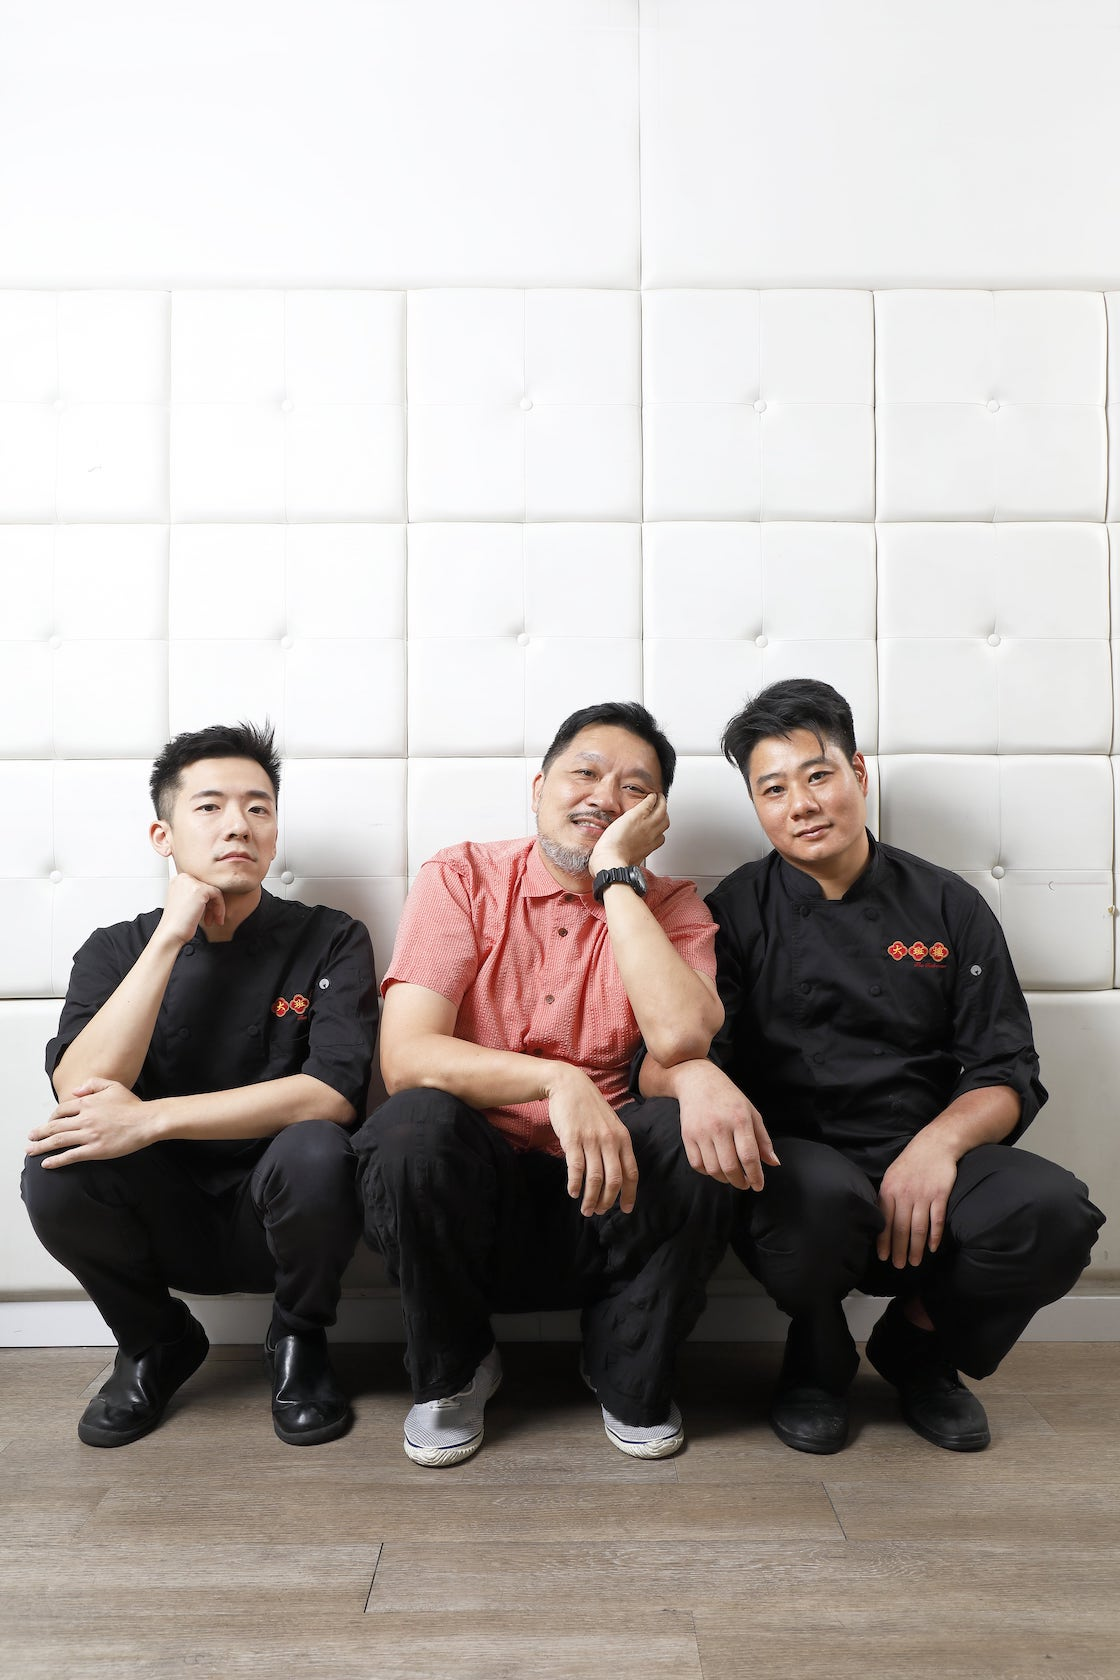 danny-yip-the-chairman-andy-ho-chef-keung.JPG